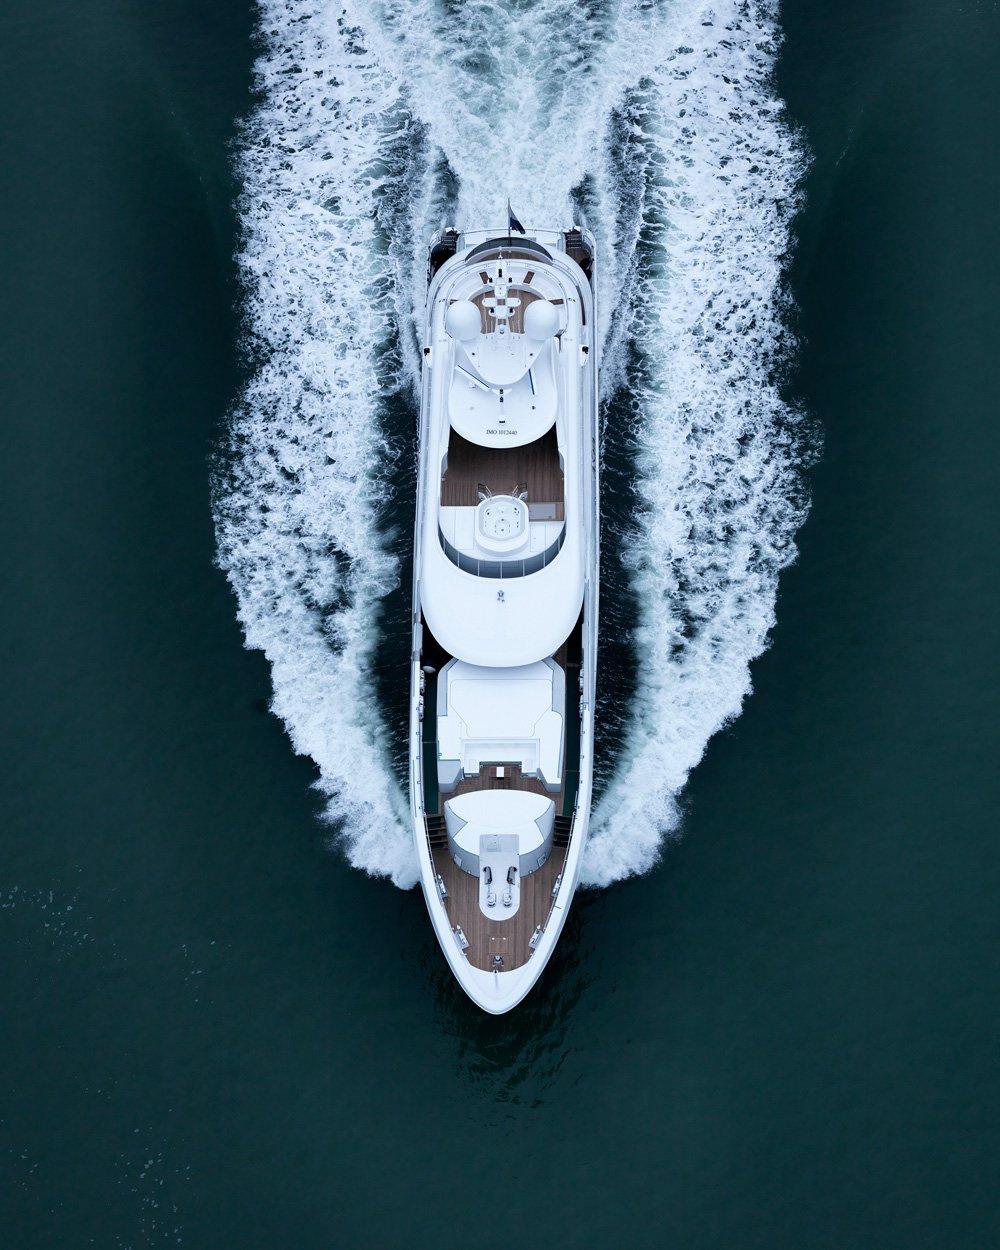 14216-heesen-yachts-deliver-superyacht-asya